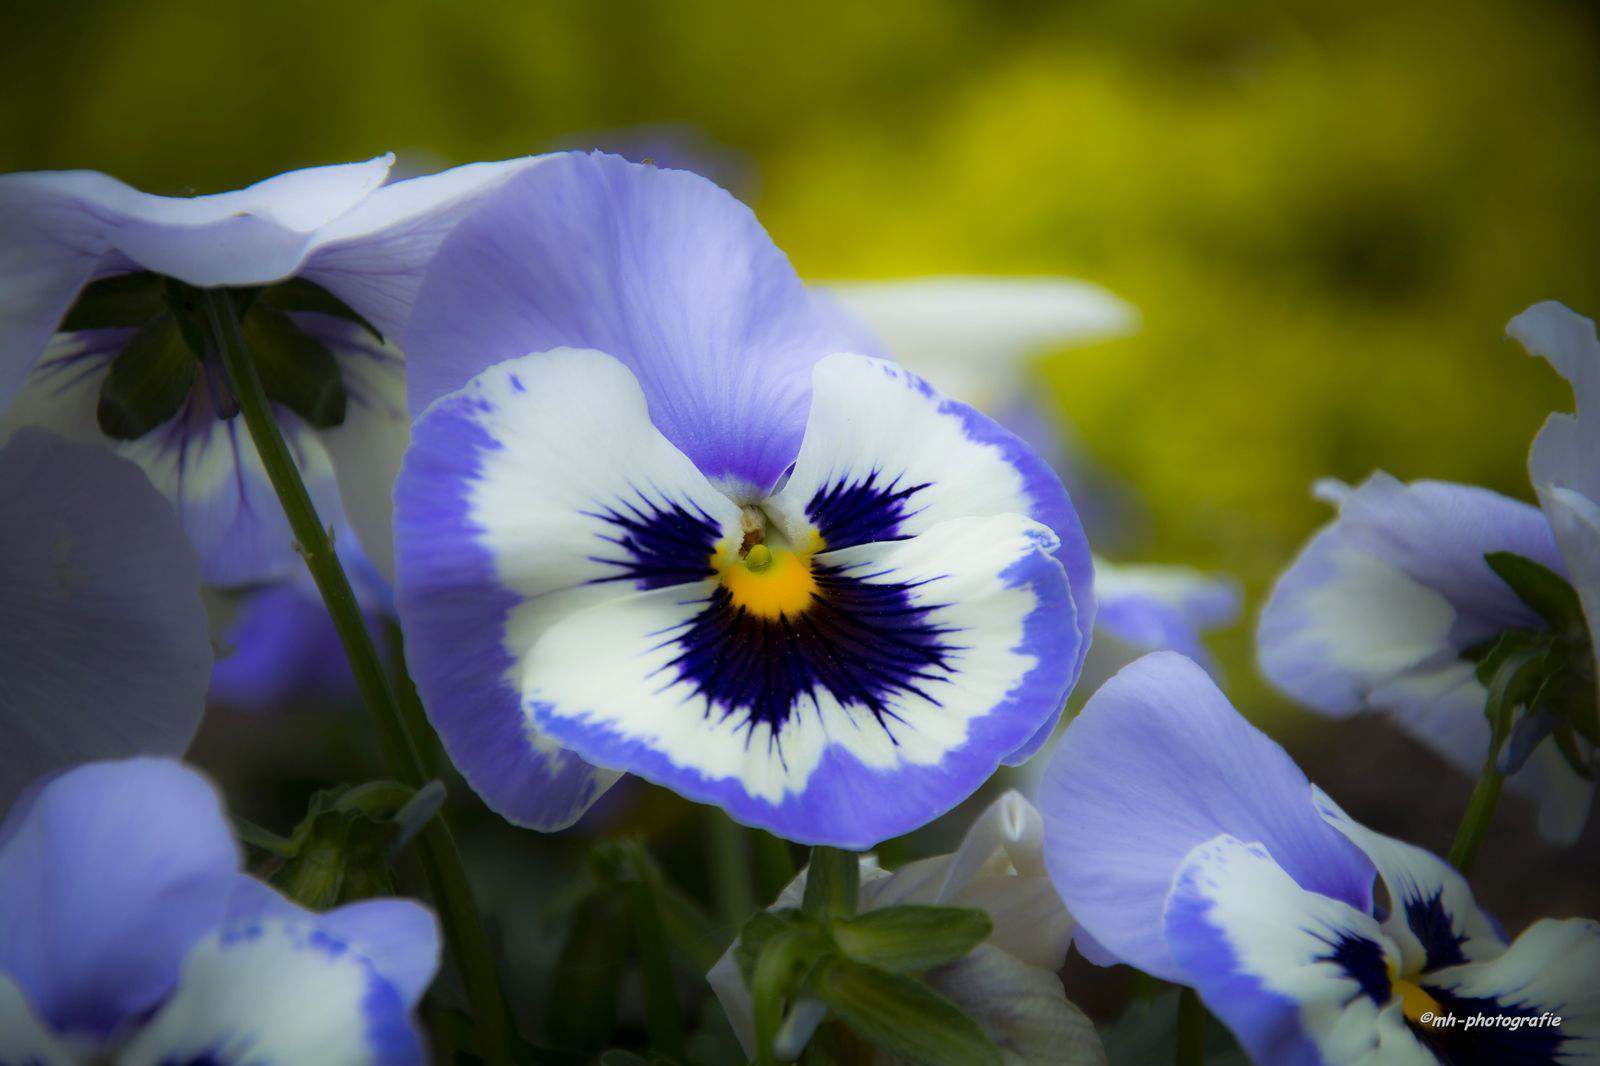 Blumen-DSC_4911-mh-photografie